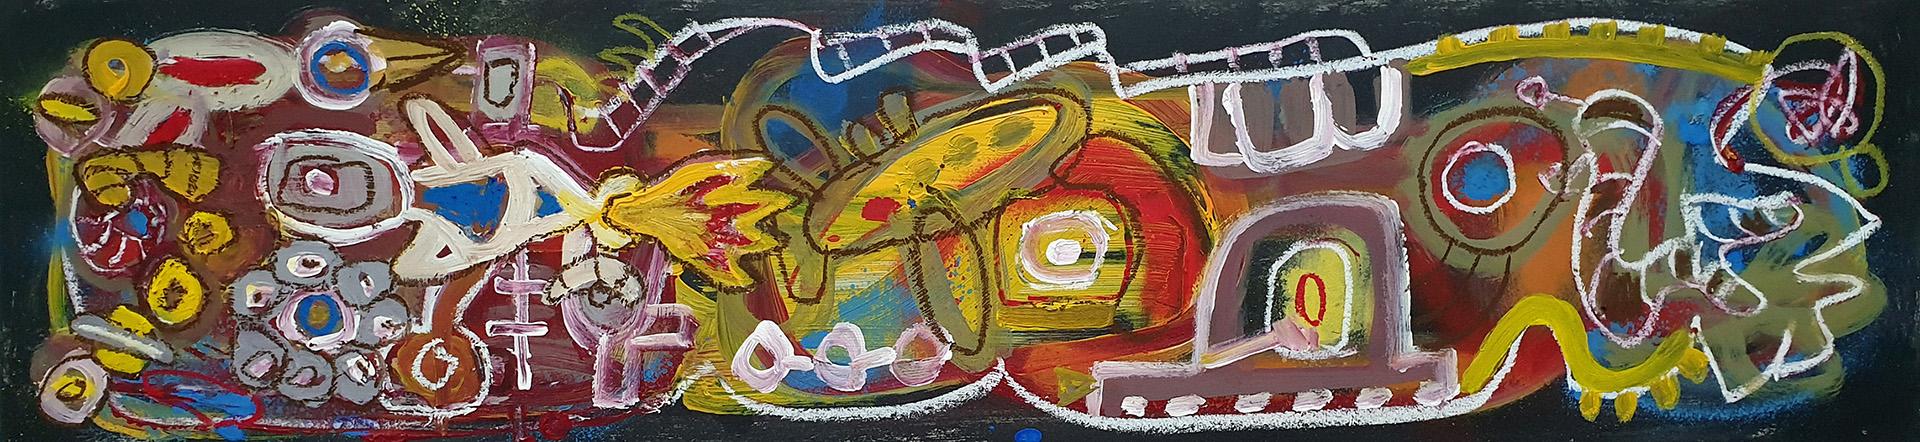 Novak-IISHOO-Contemporary-Art-20100101-DVNV1-David-Novak-2009-0020